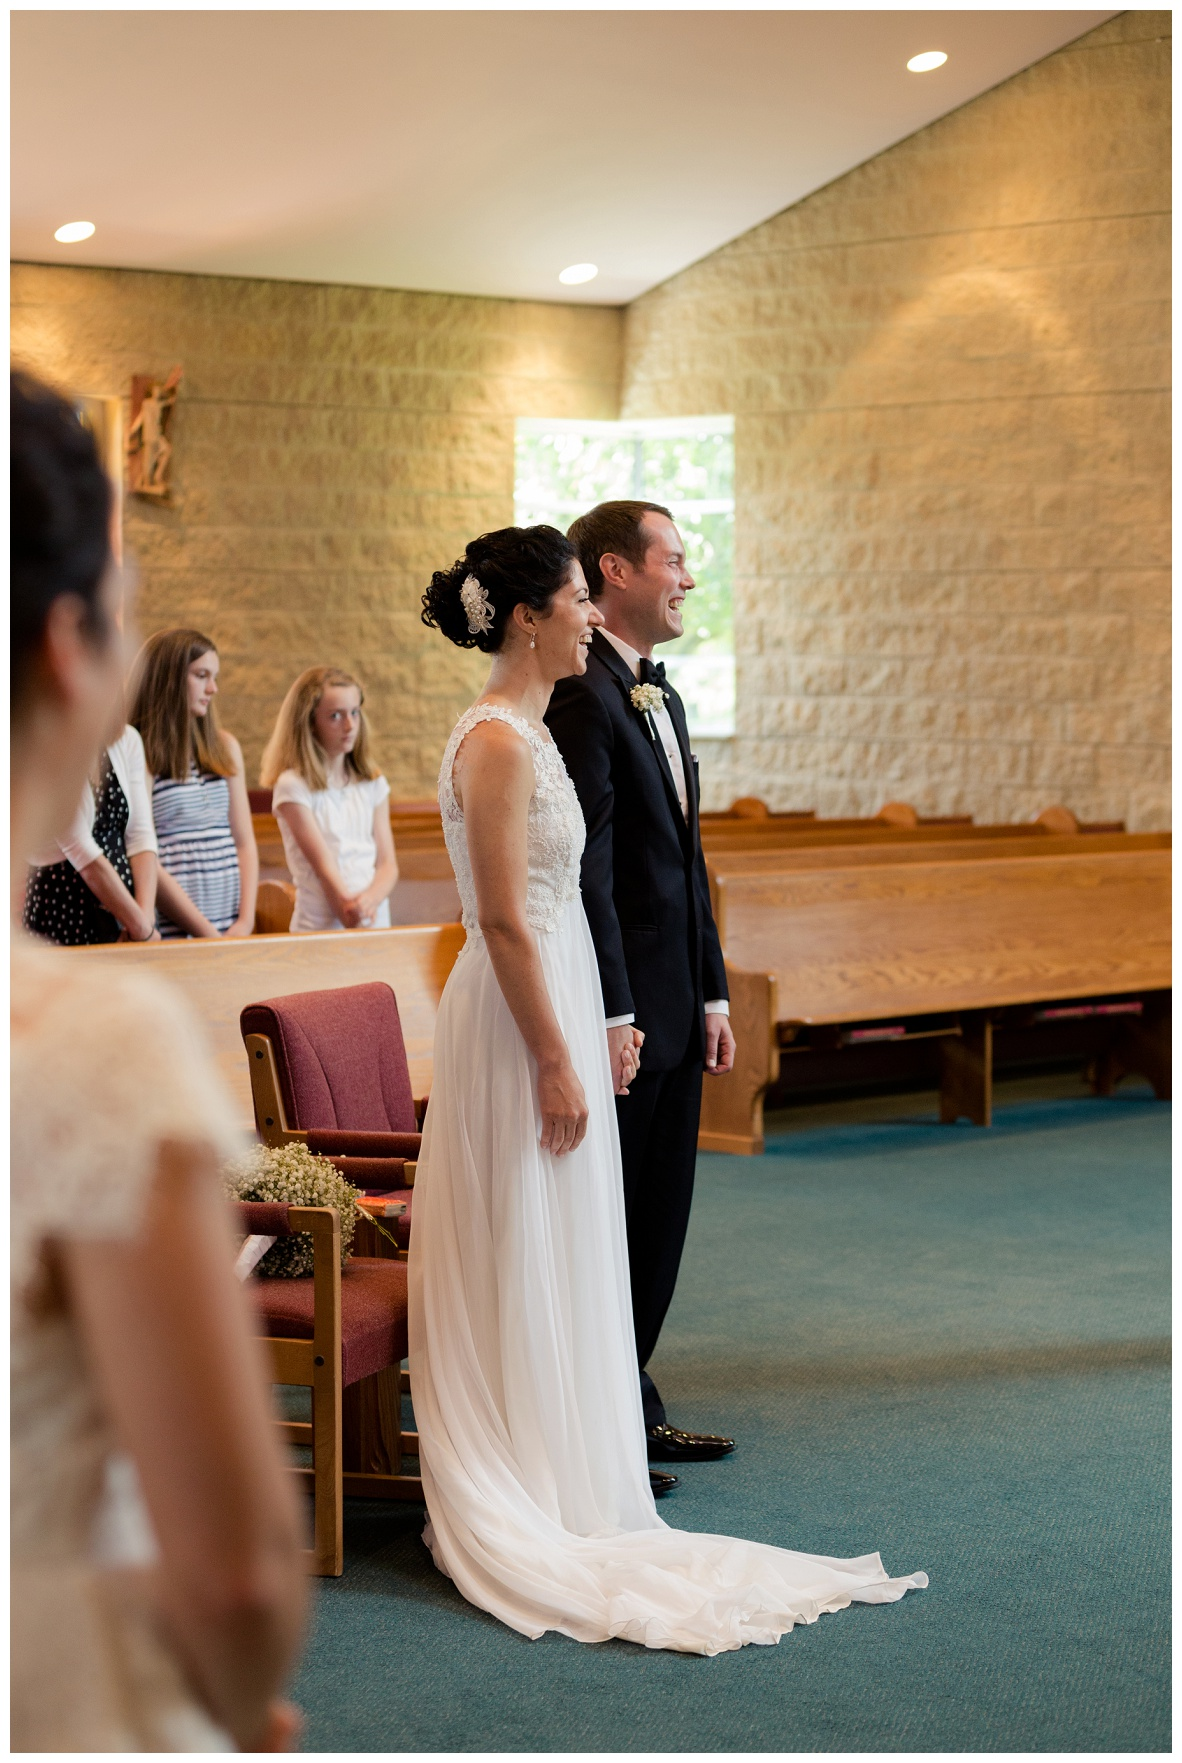 The Wedding of Danielle and Matt_0033.jpg